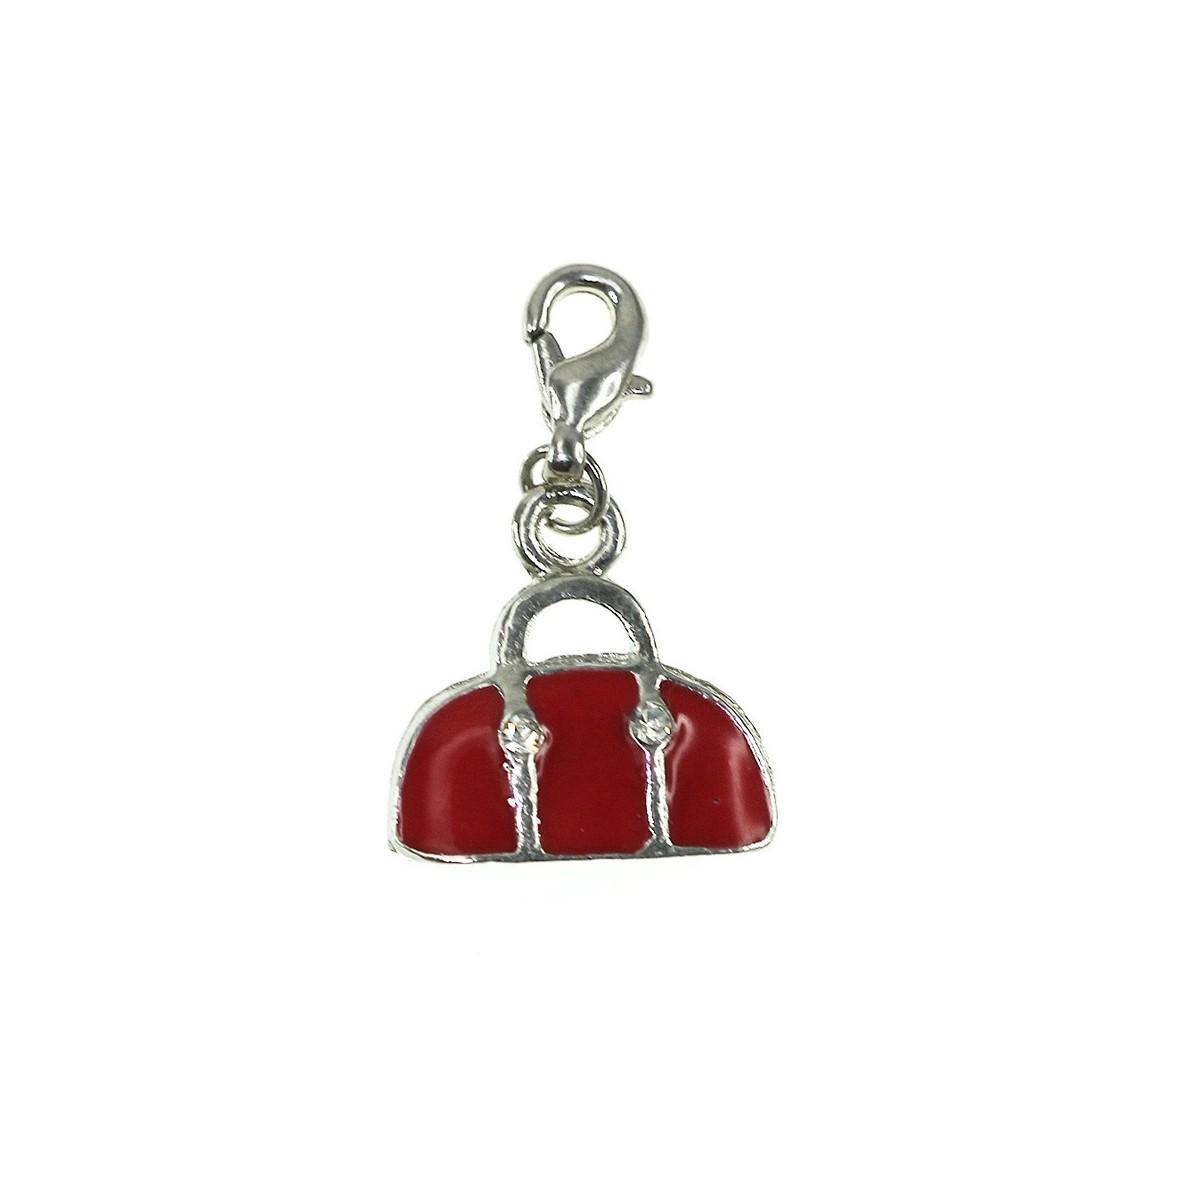 Breloque charm sac rouge So Charm